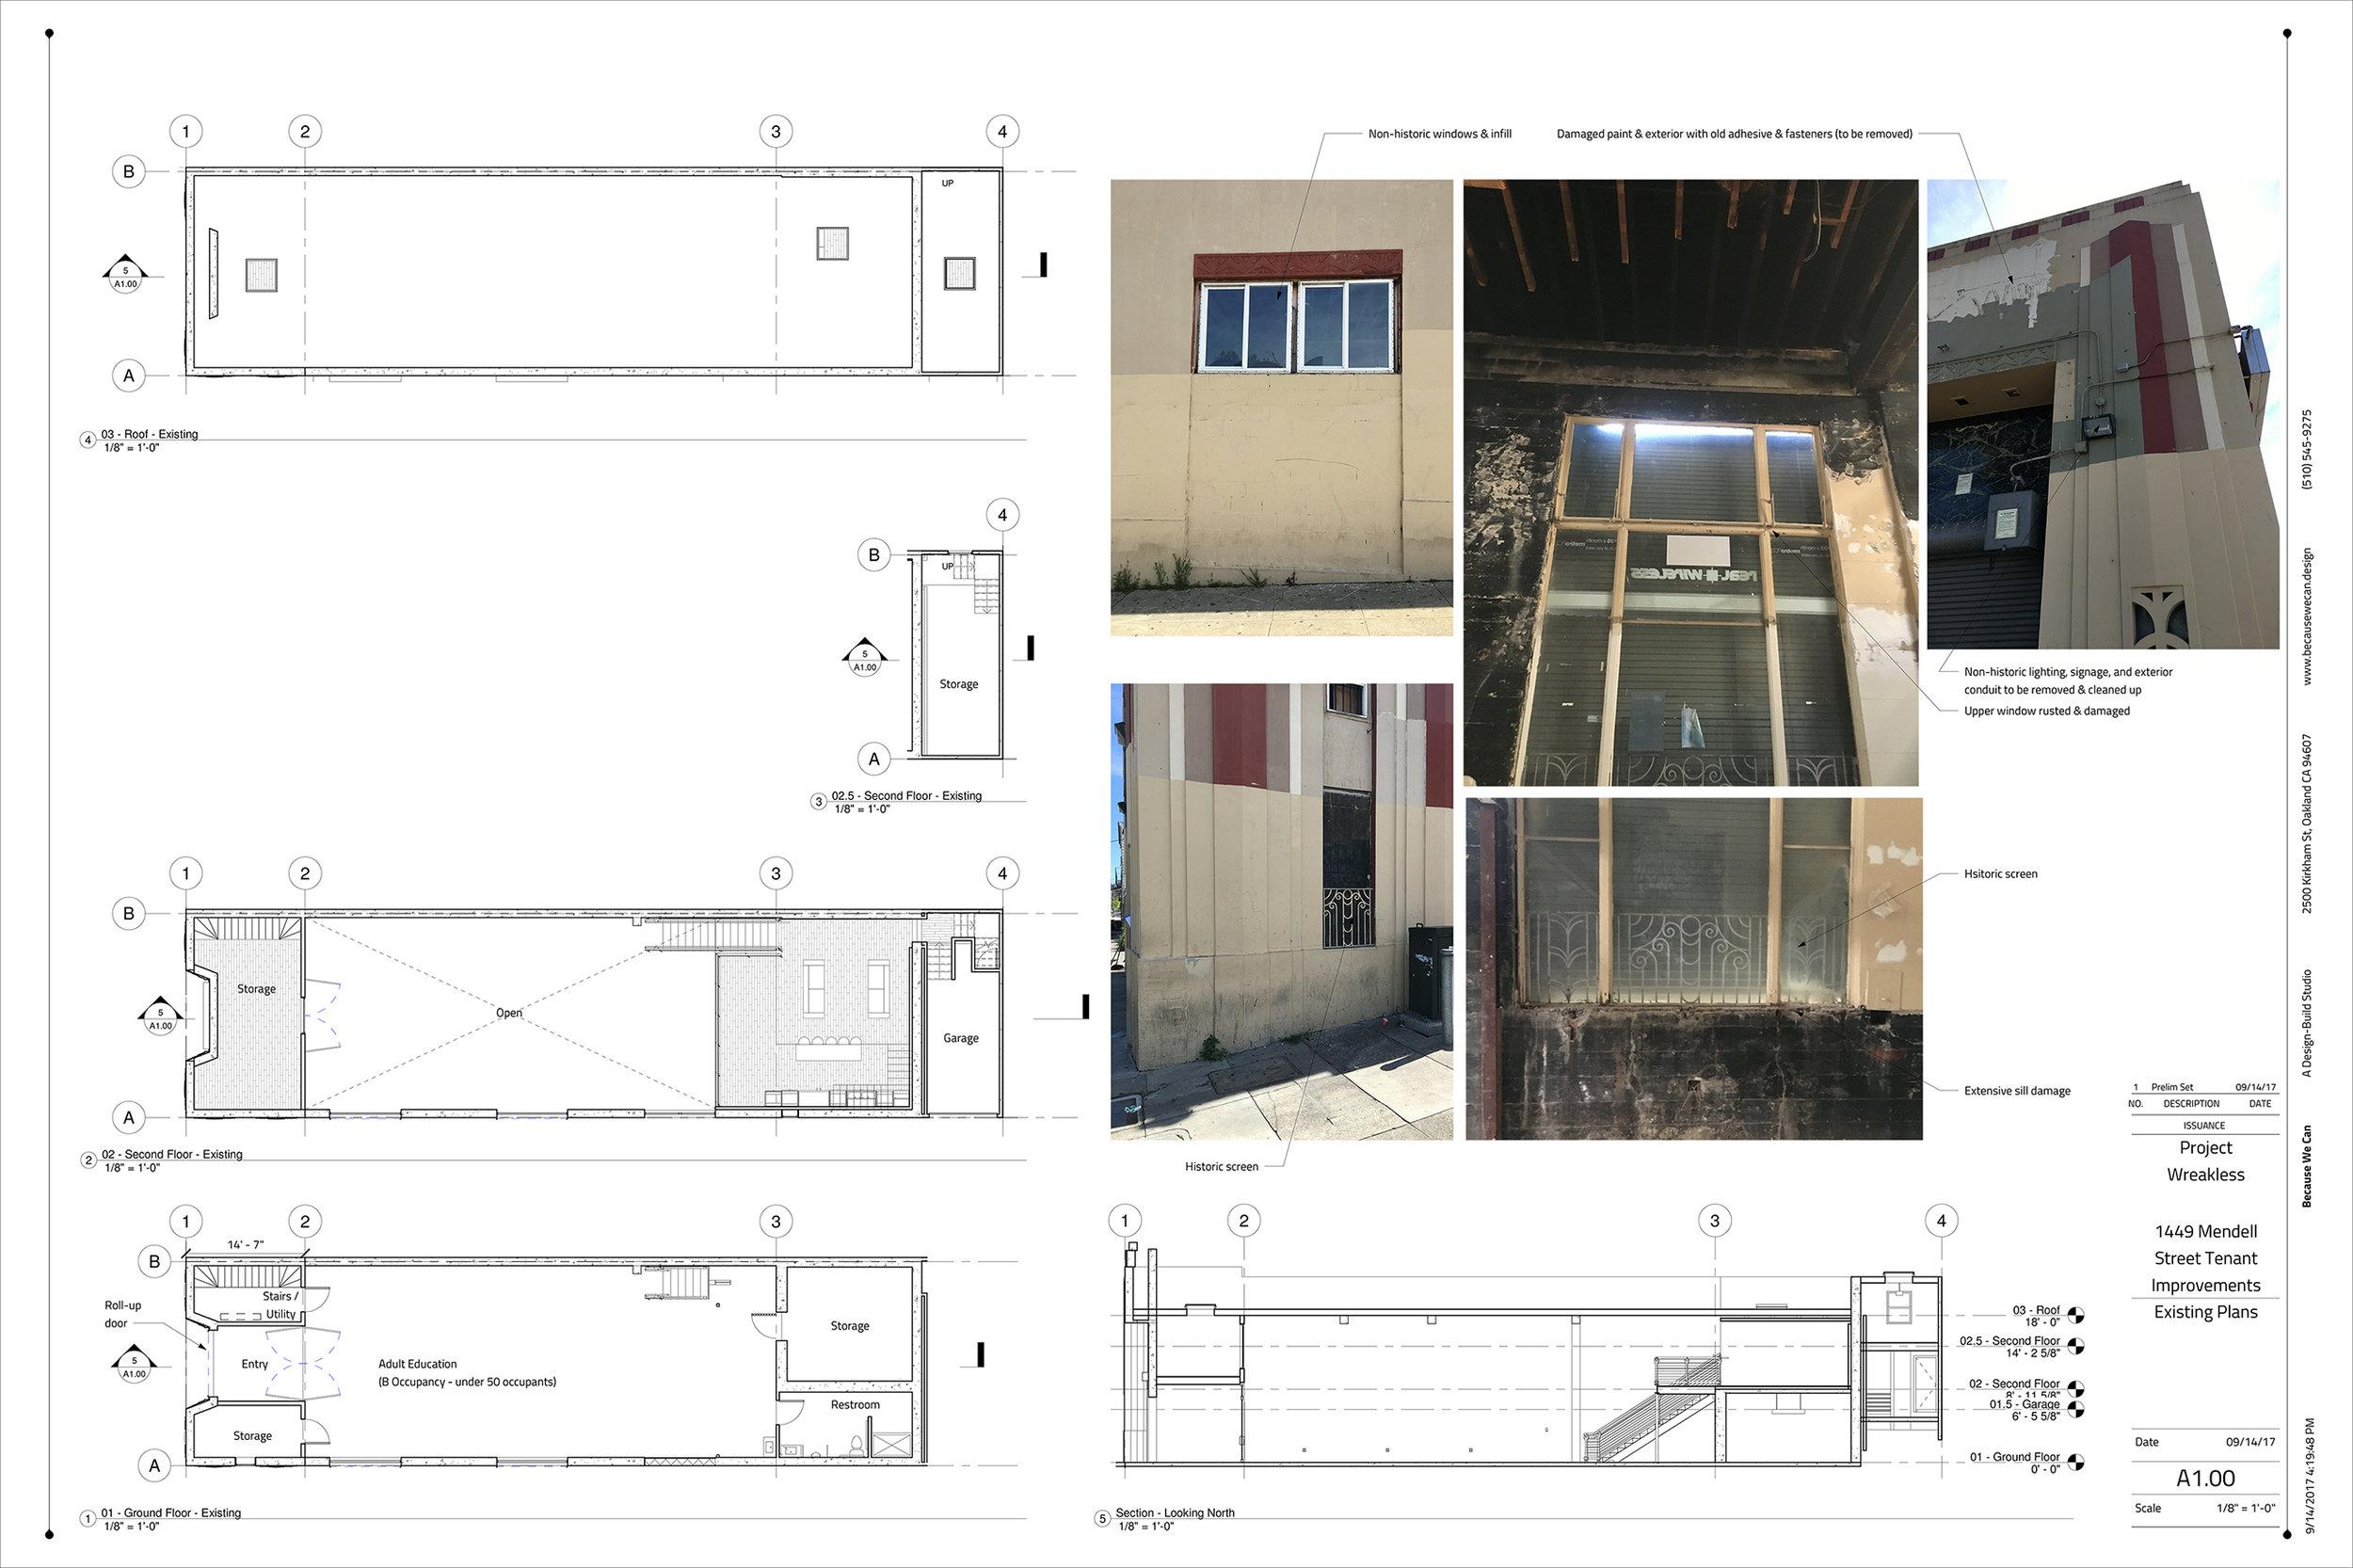 091417_1449 Mendell_Exterior Prelim Set-2.jpg